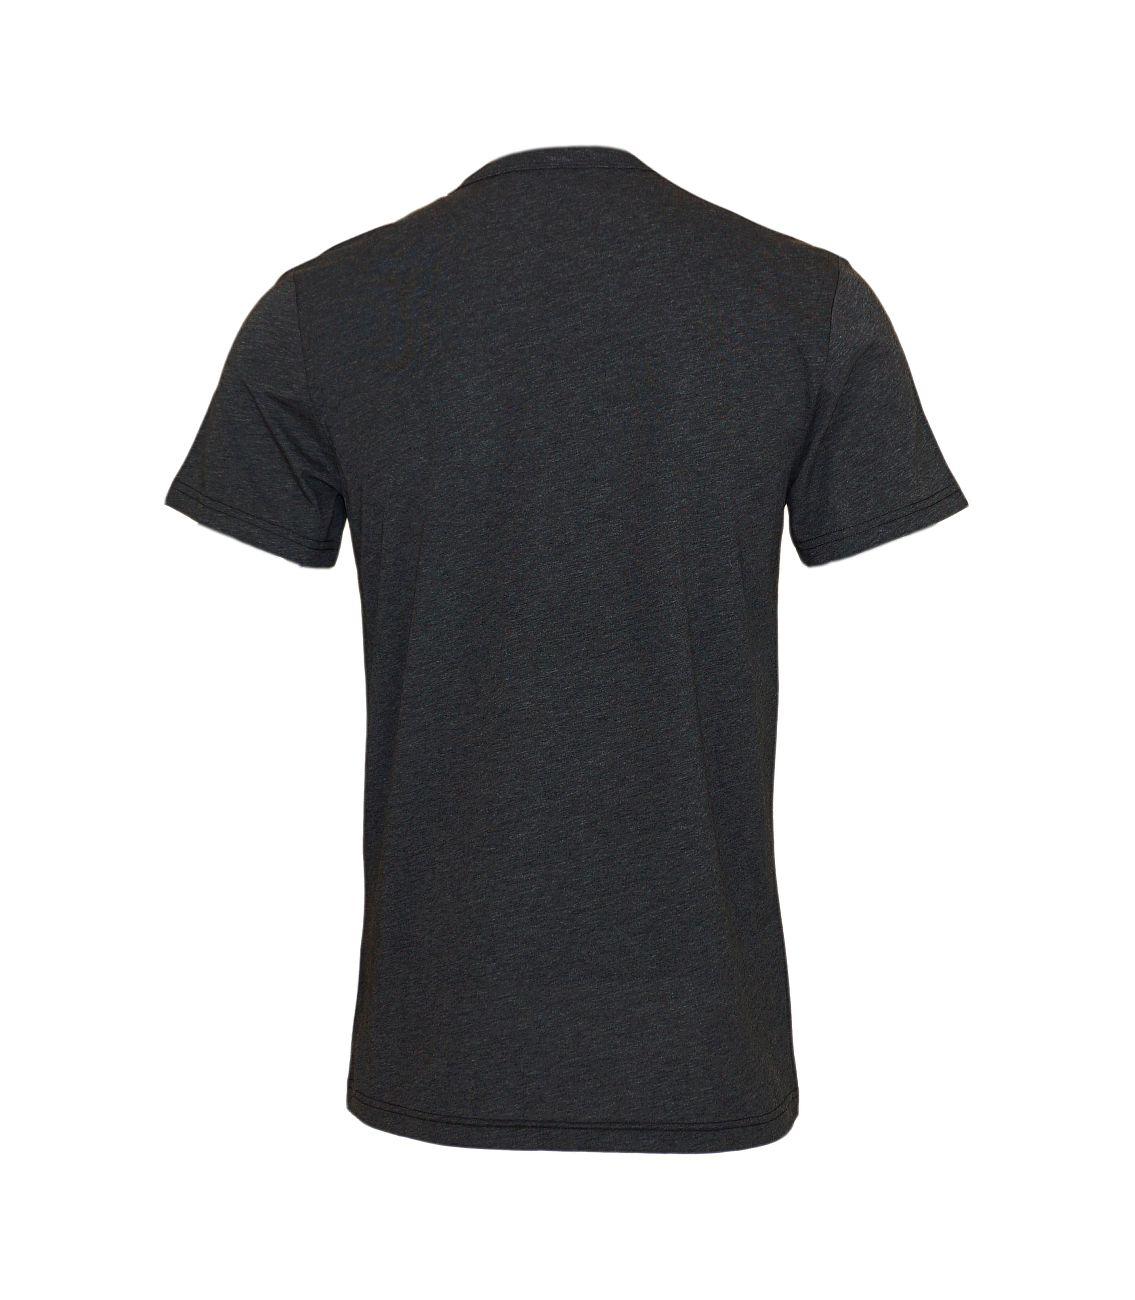 G-Star RAW T-Shirt Cadulor rt D08510.2757.390 81 Black Htr F18-GST1